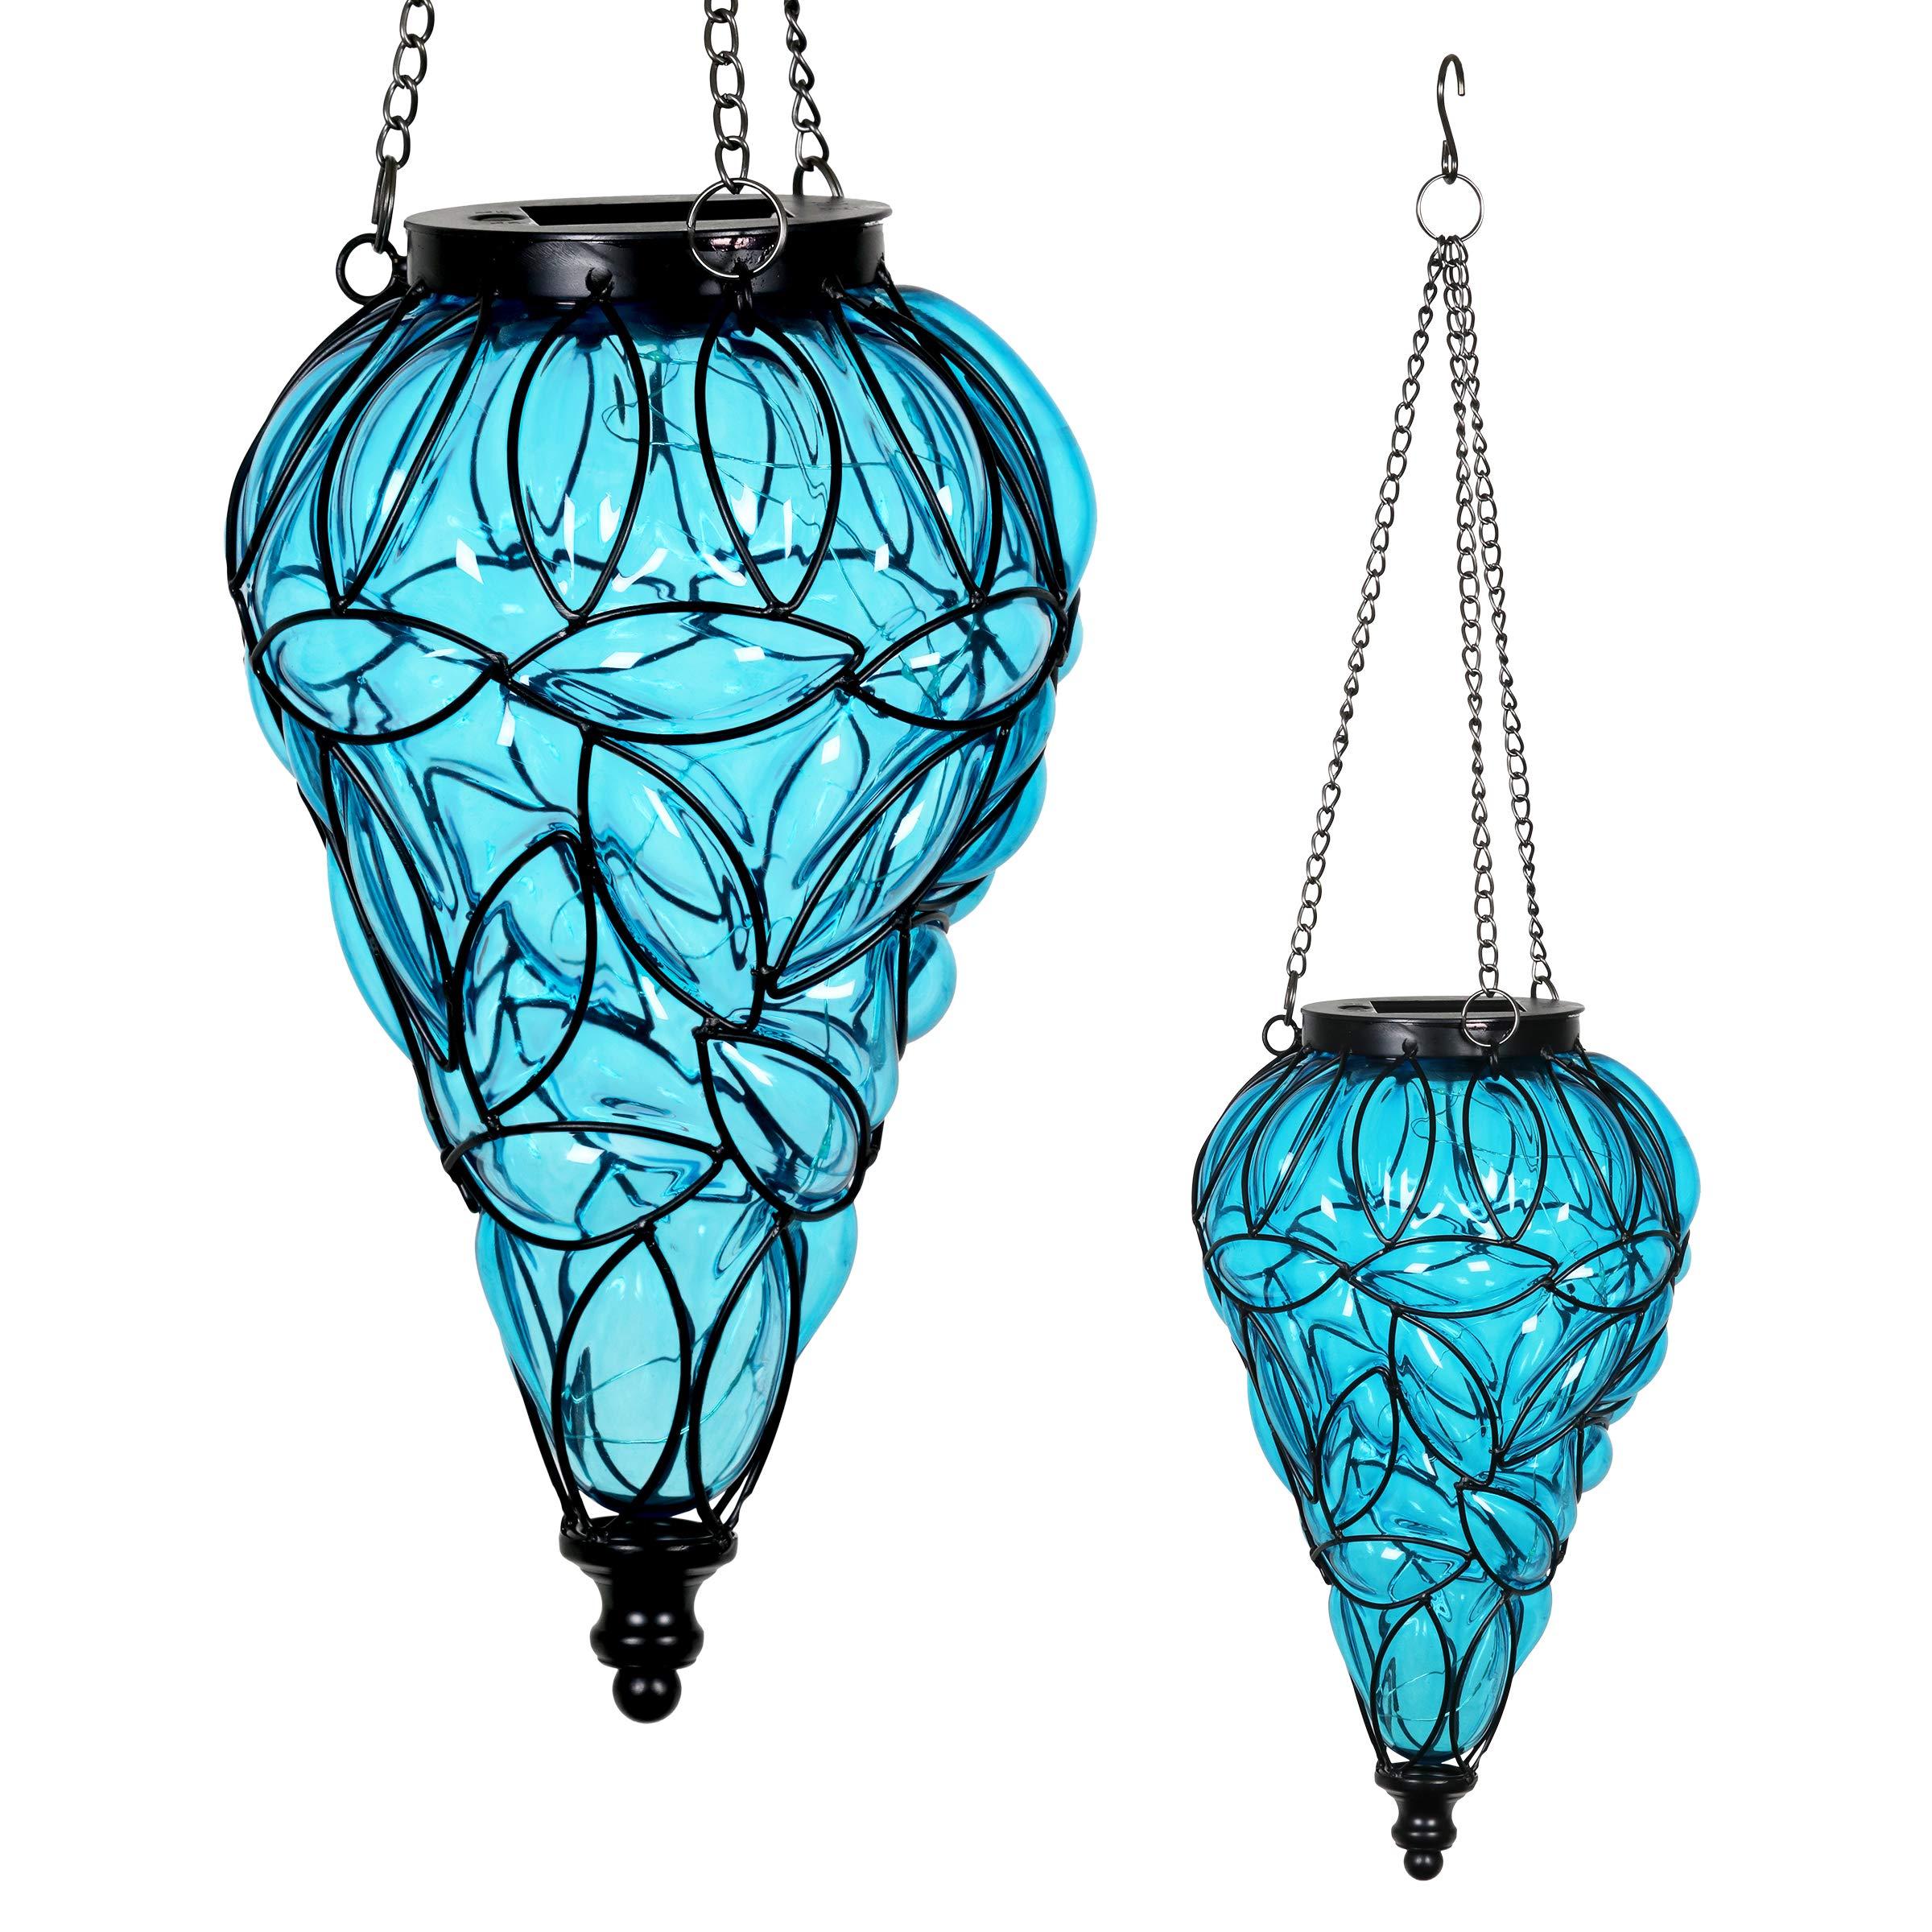 Exhart Blue Solar Lantern - Glass Tear-Shaped Hanging Lantern - Teardrop Glass Ceiling Lantern Hangs in a Metal Cage w/ 12 Blue LED Firefly Solar Lights 7'' L x 7'' W x 24'' H